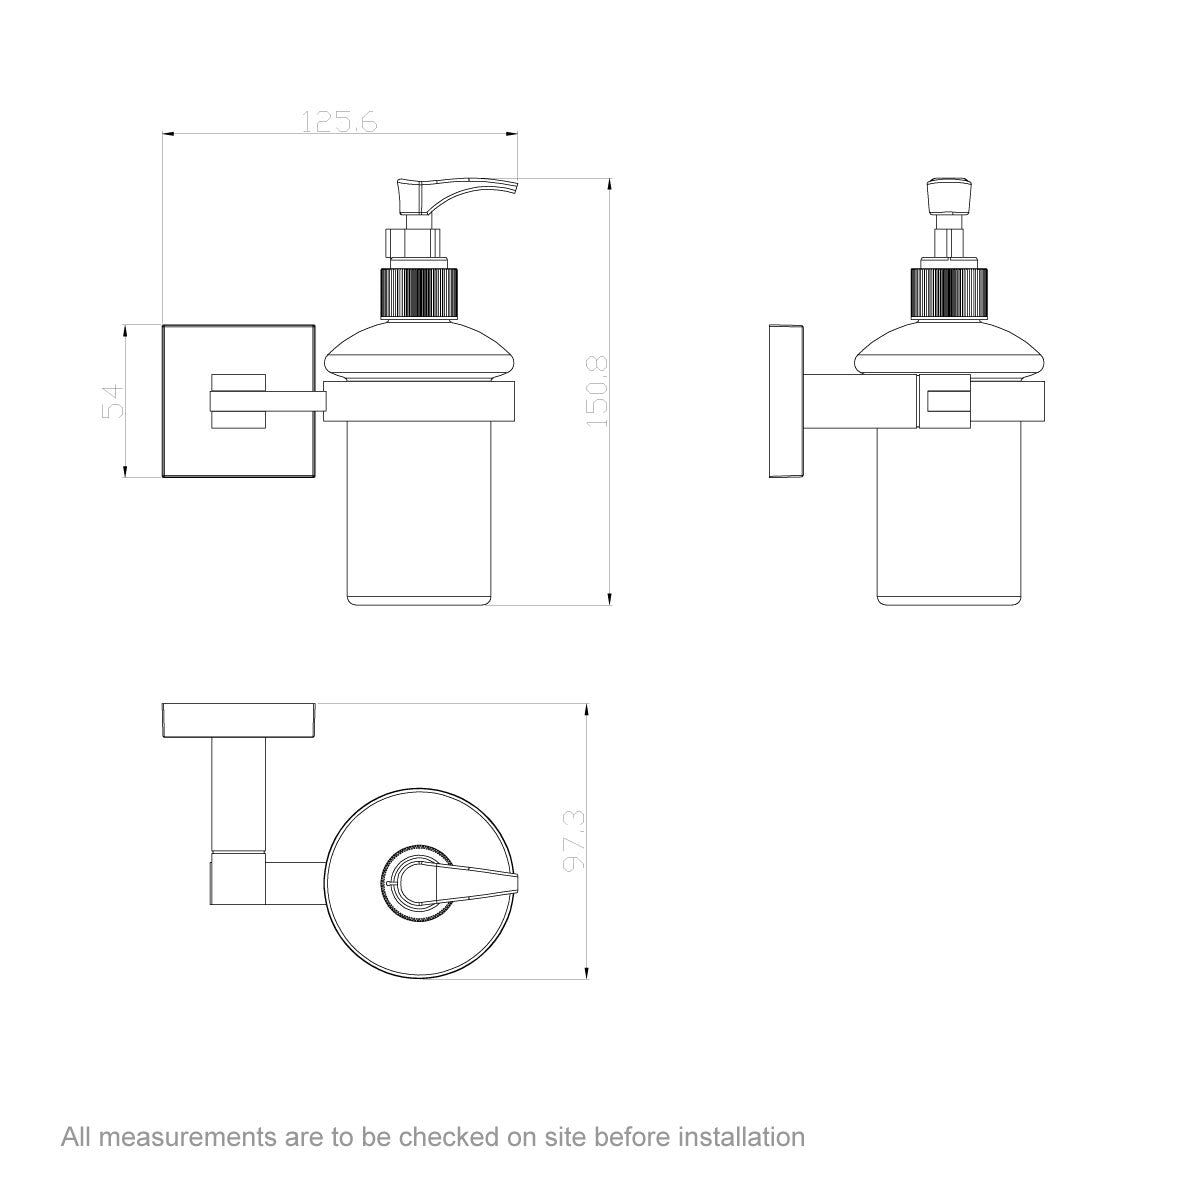 Dimensions for Flex soap dispenser